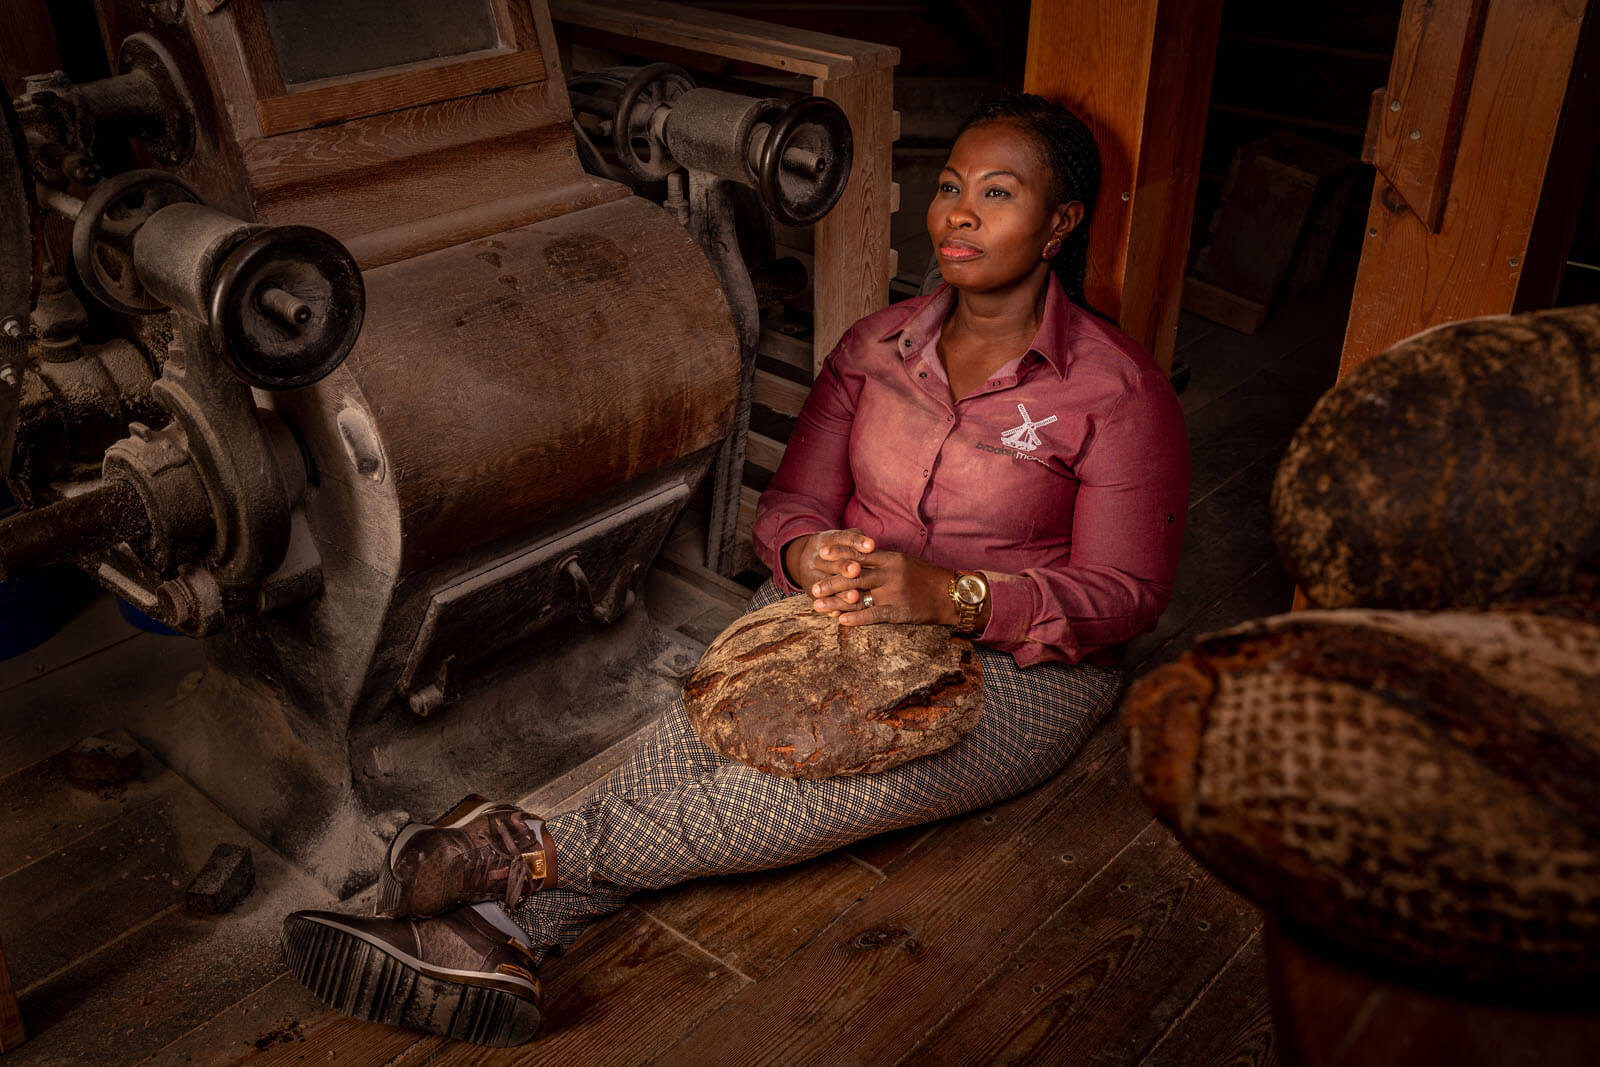 Diversity-Fotoshooting in der Braaker Mühle